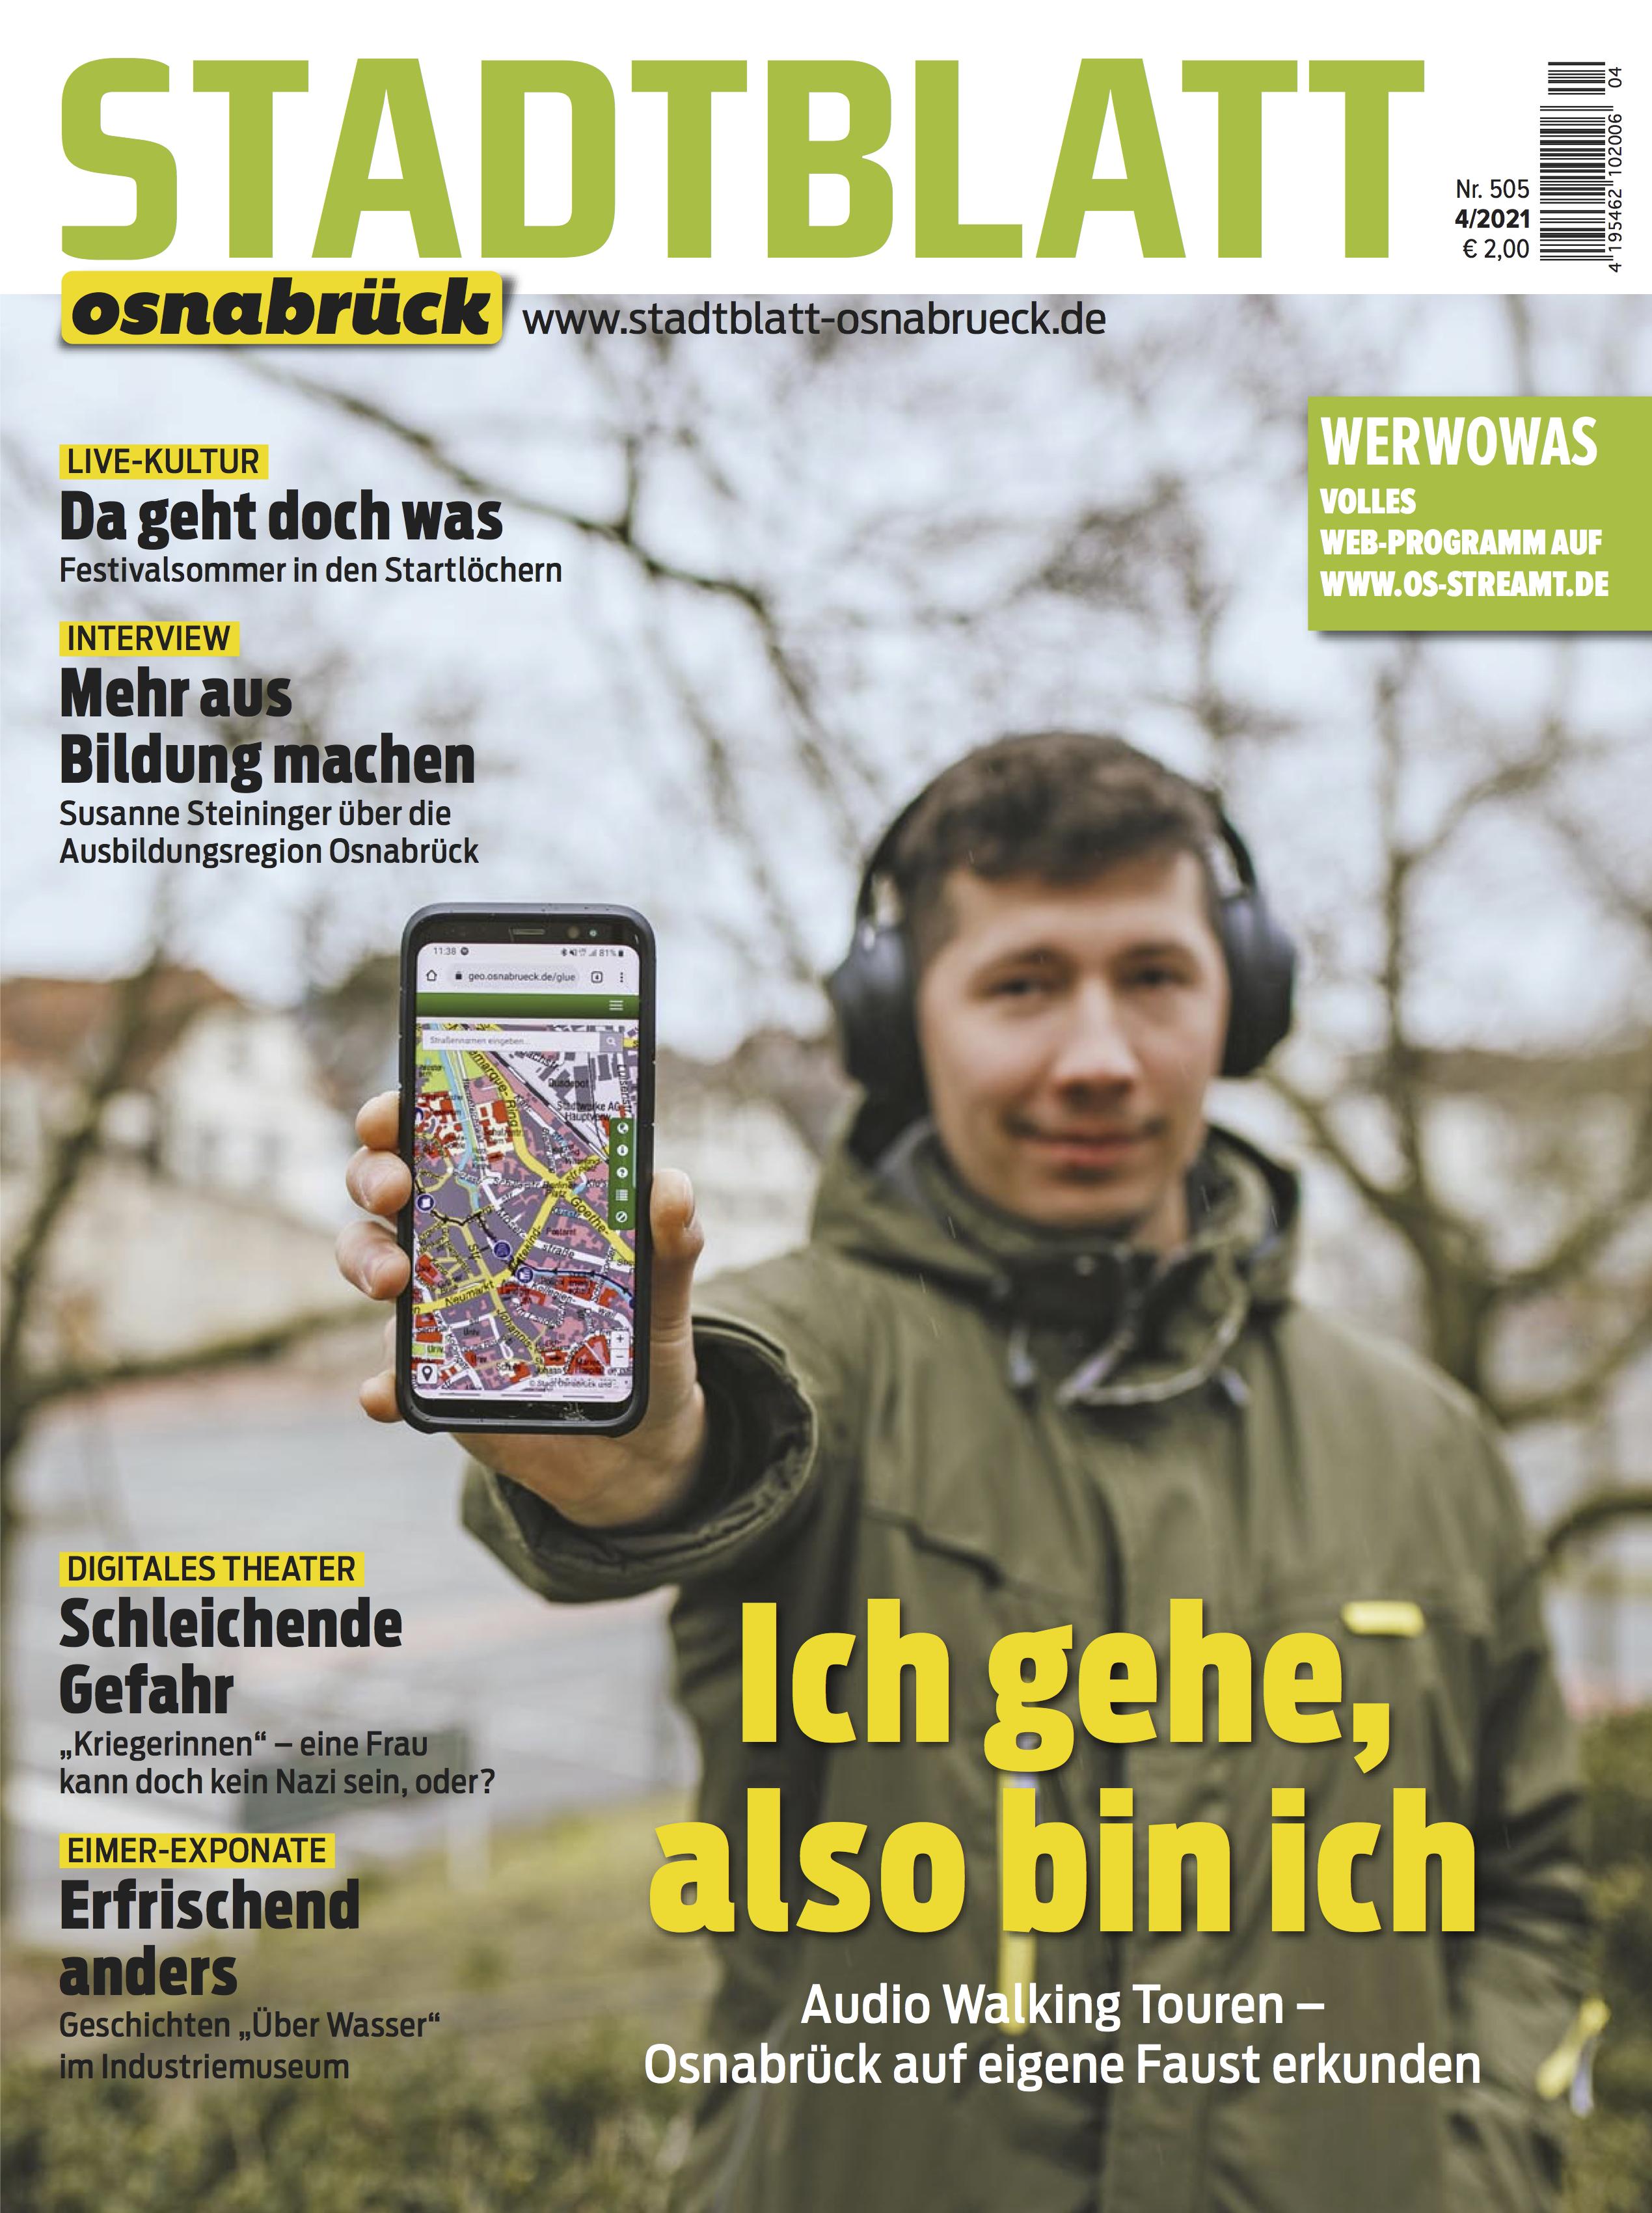 Stadtblatt_2021_04 1